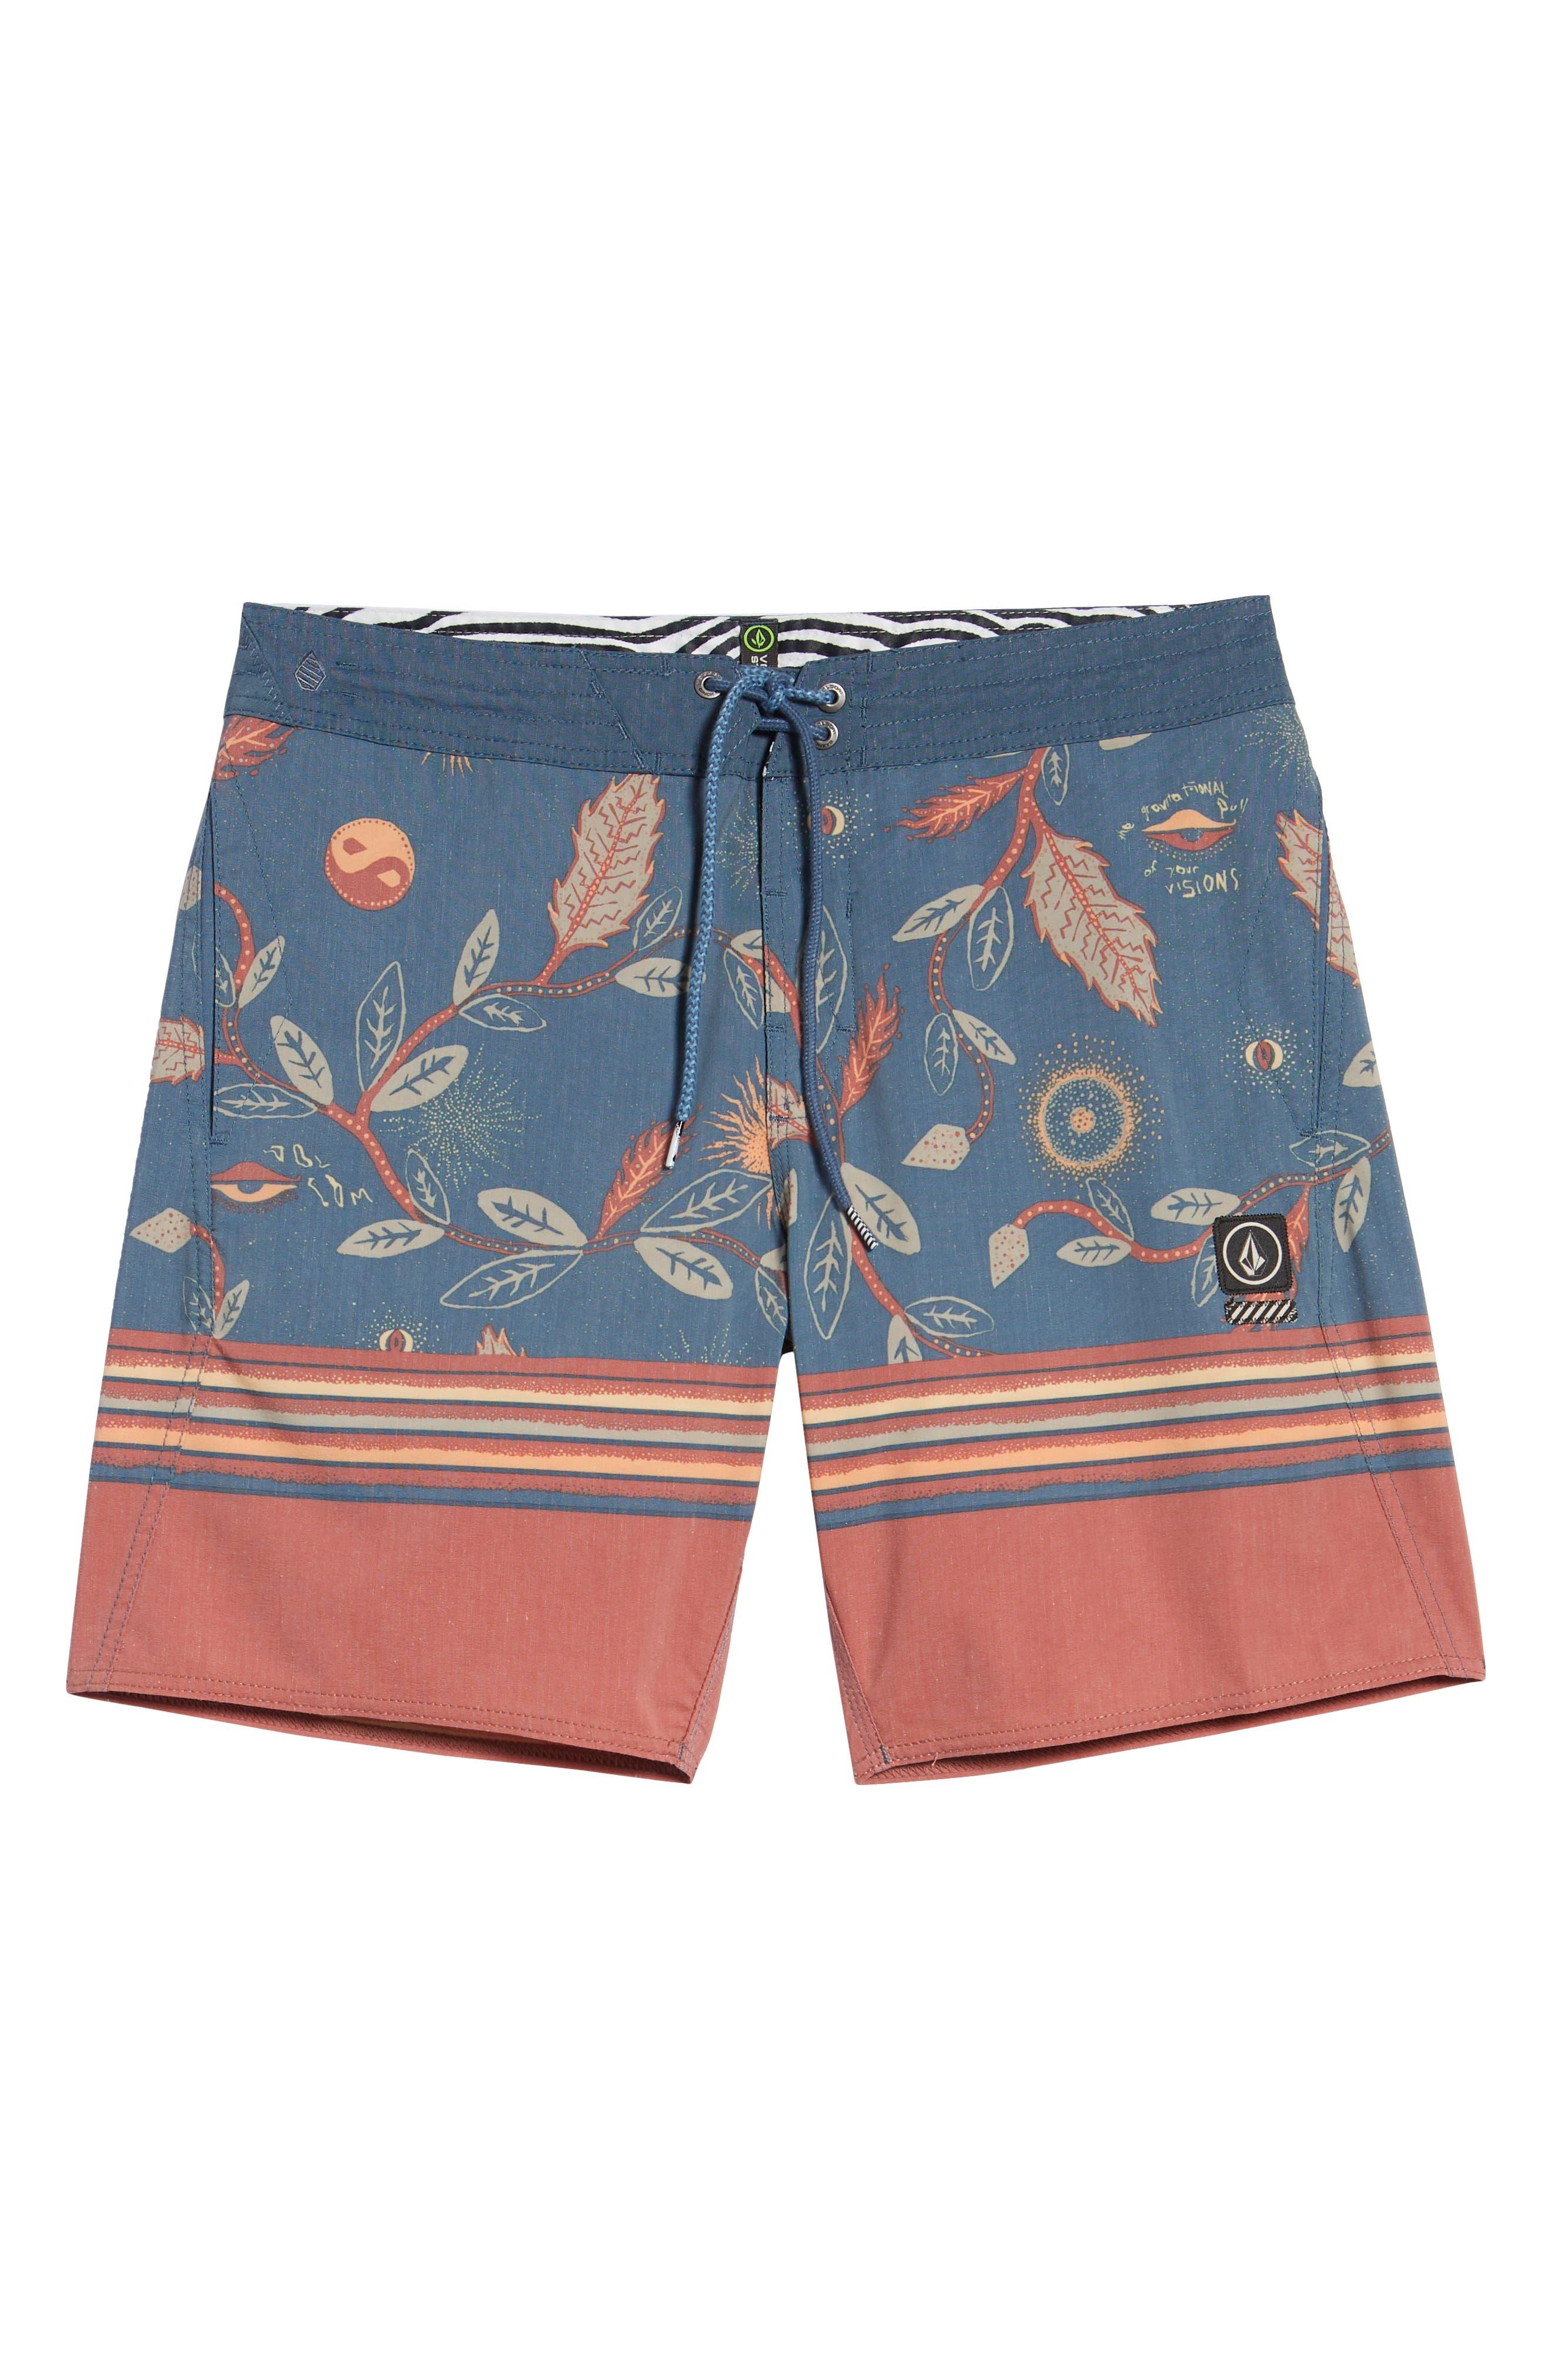 Lucid Stoney Board Shorts,                             Alternate thumbnail 6, color,                             Deep Blue